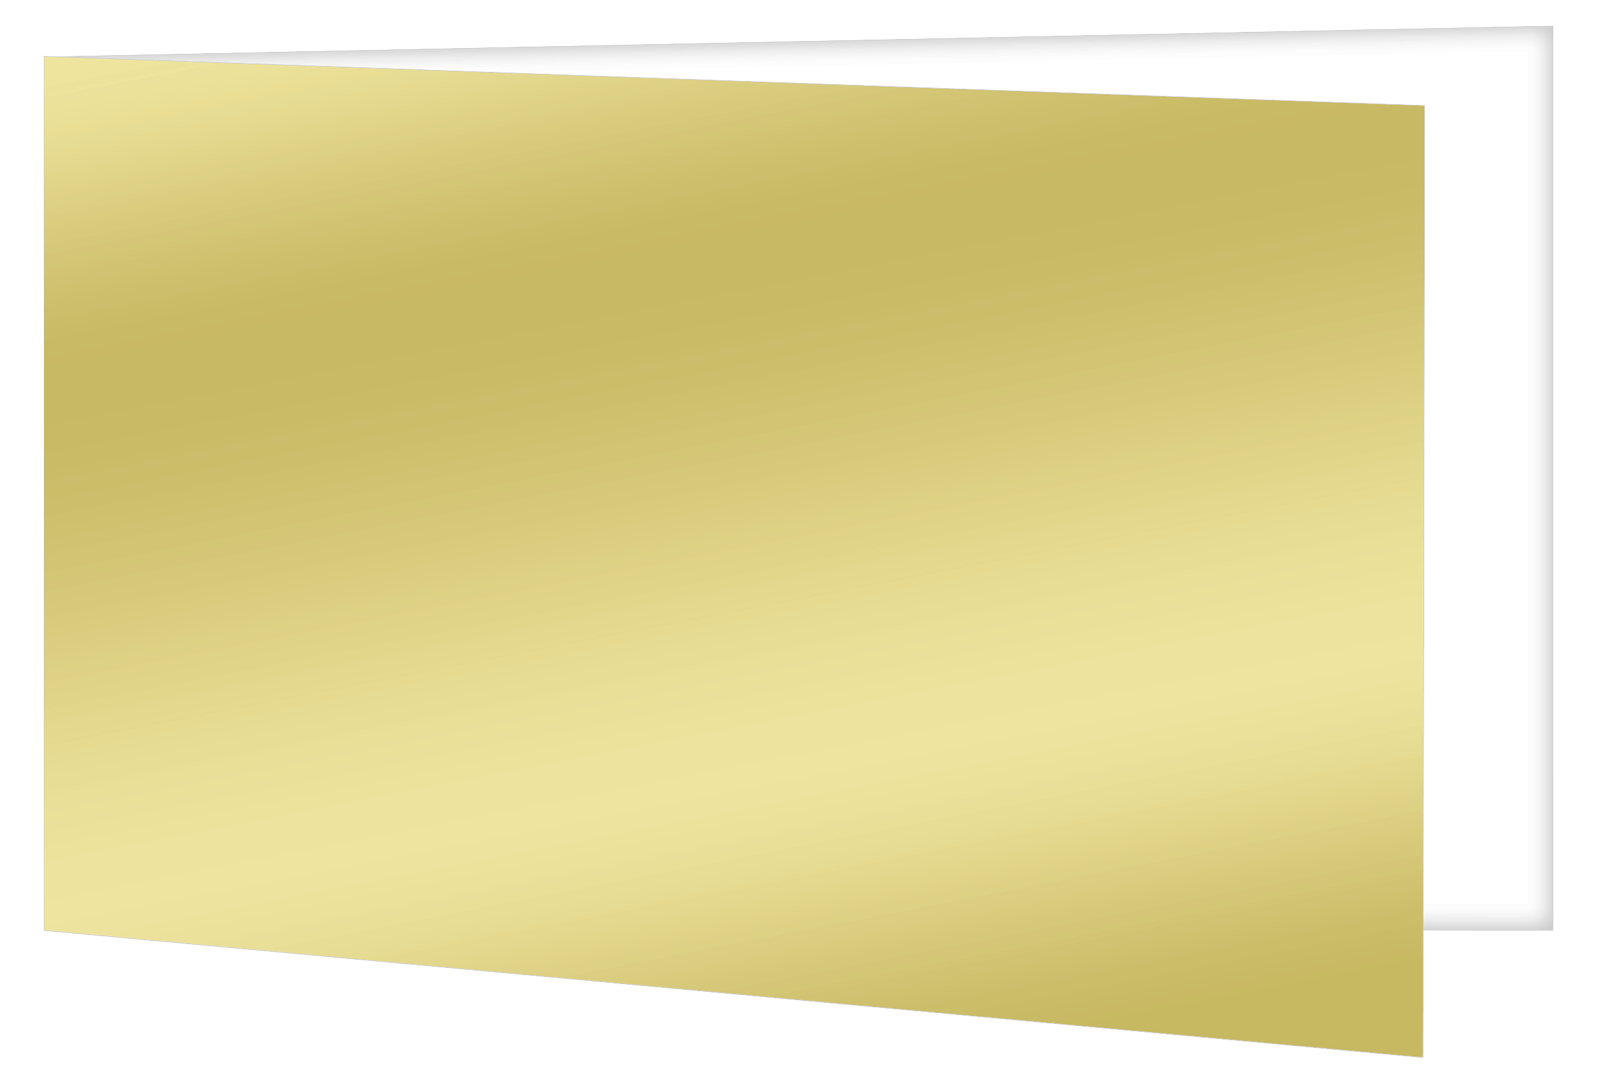 Einlegeblatt 835